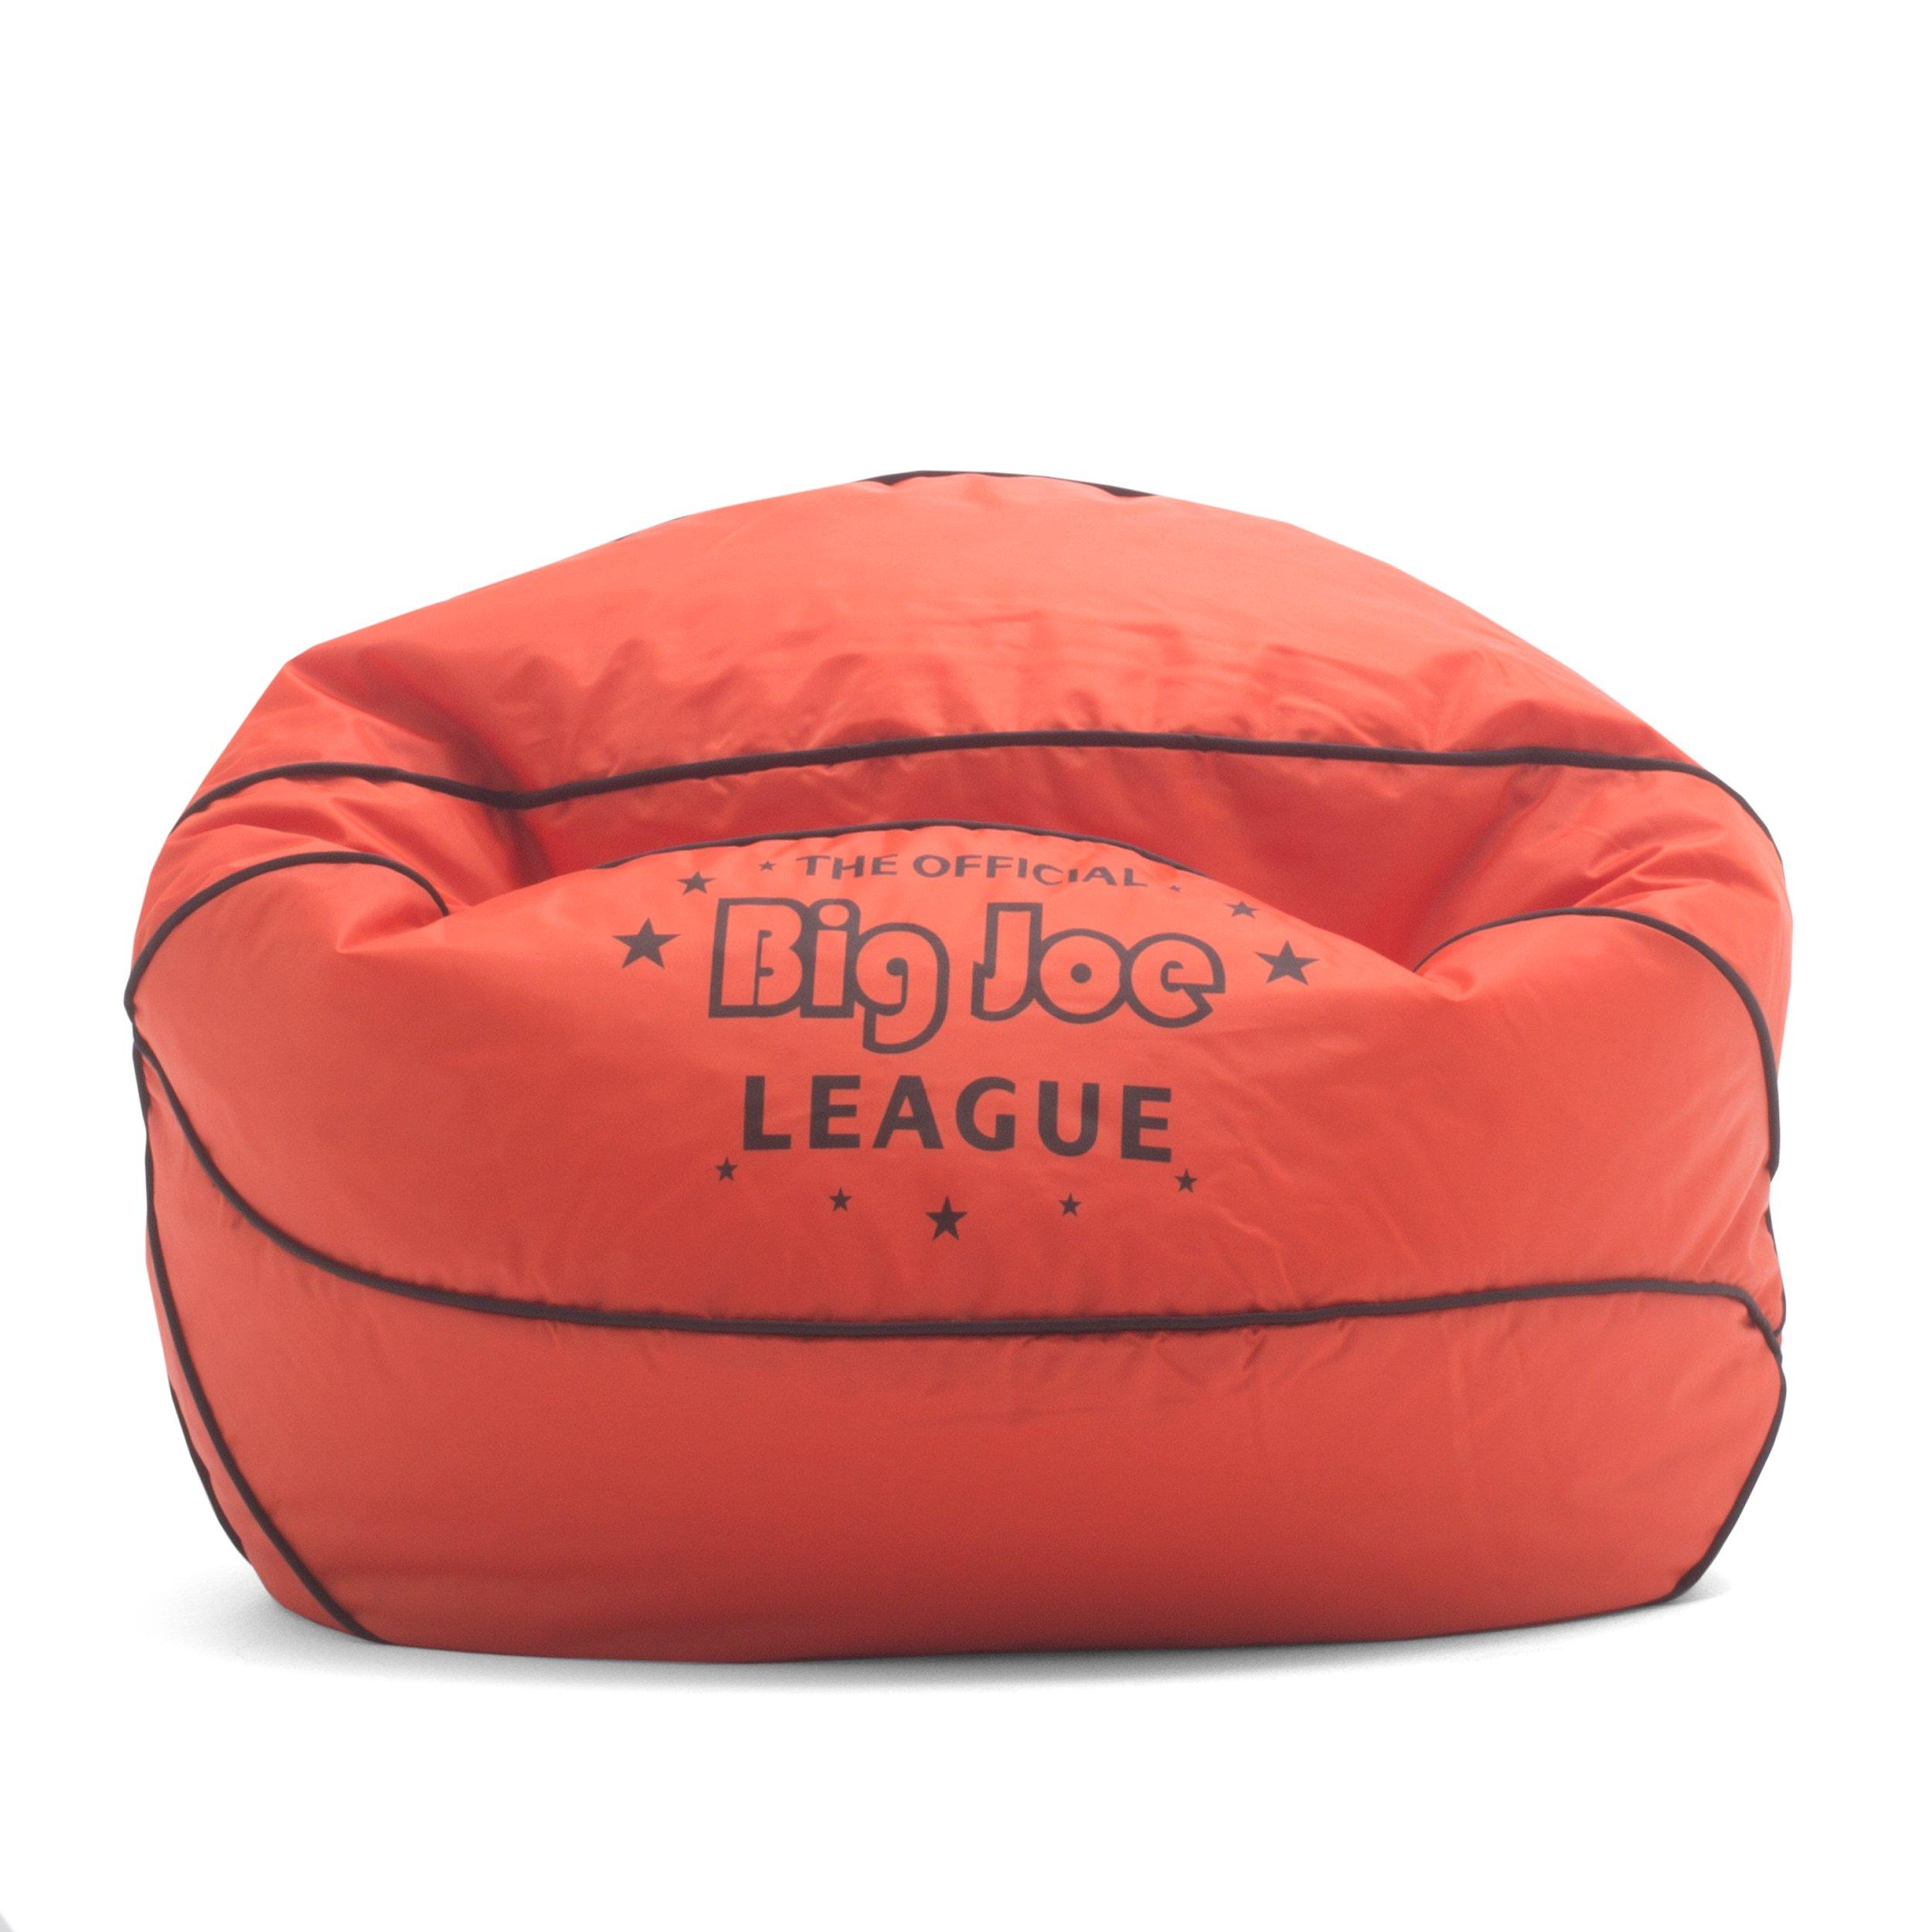 Comfort Research Big Joe Basketball Bean Bag with Smart Max Fabric